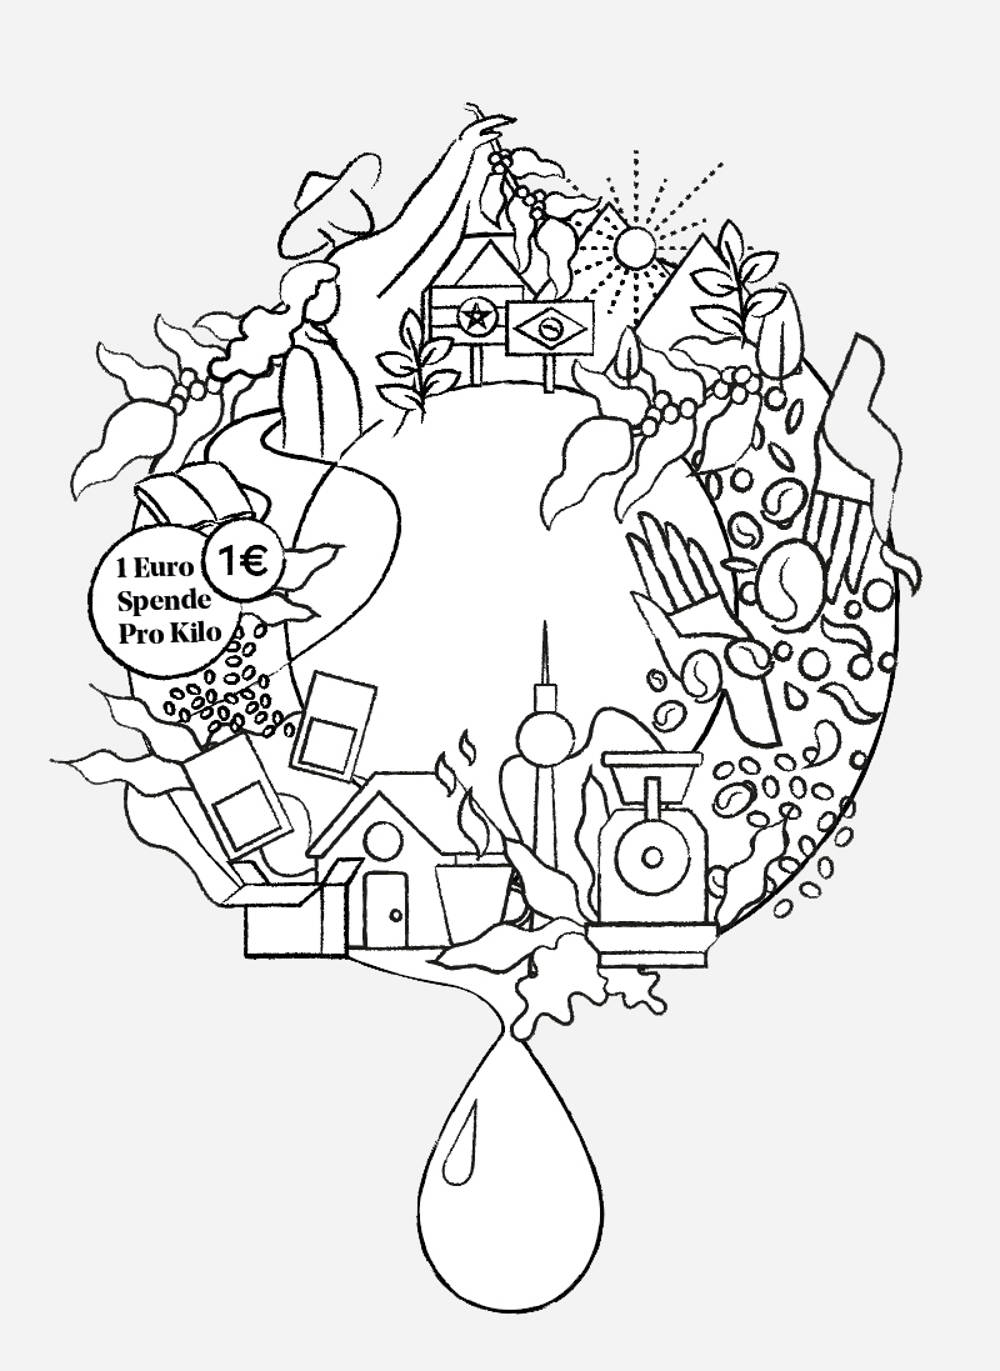 logo, the dripa